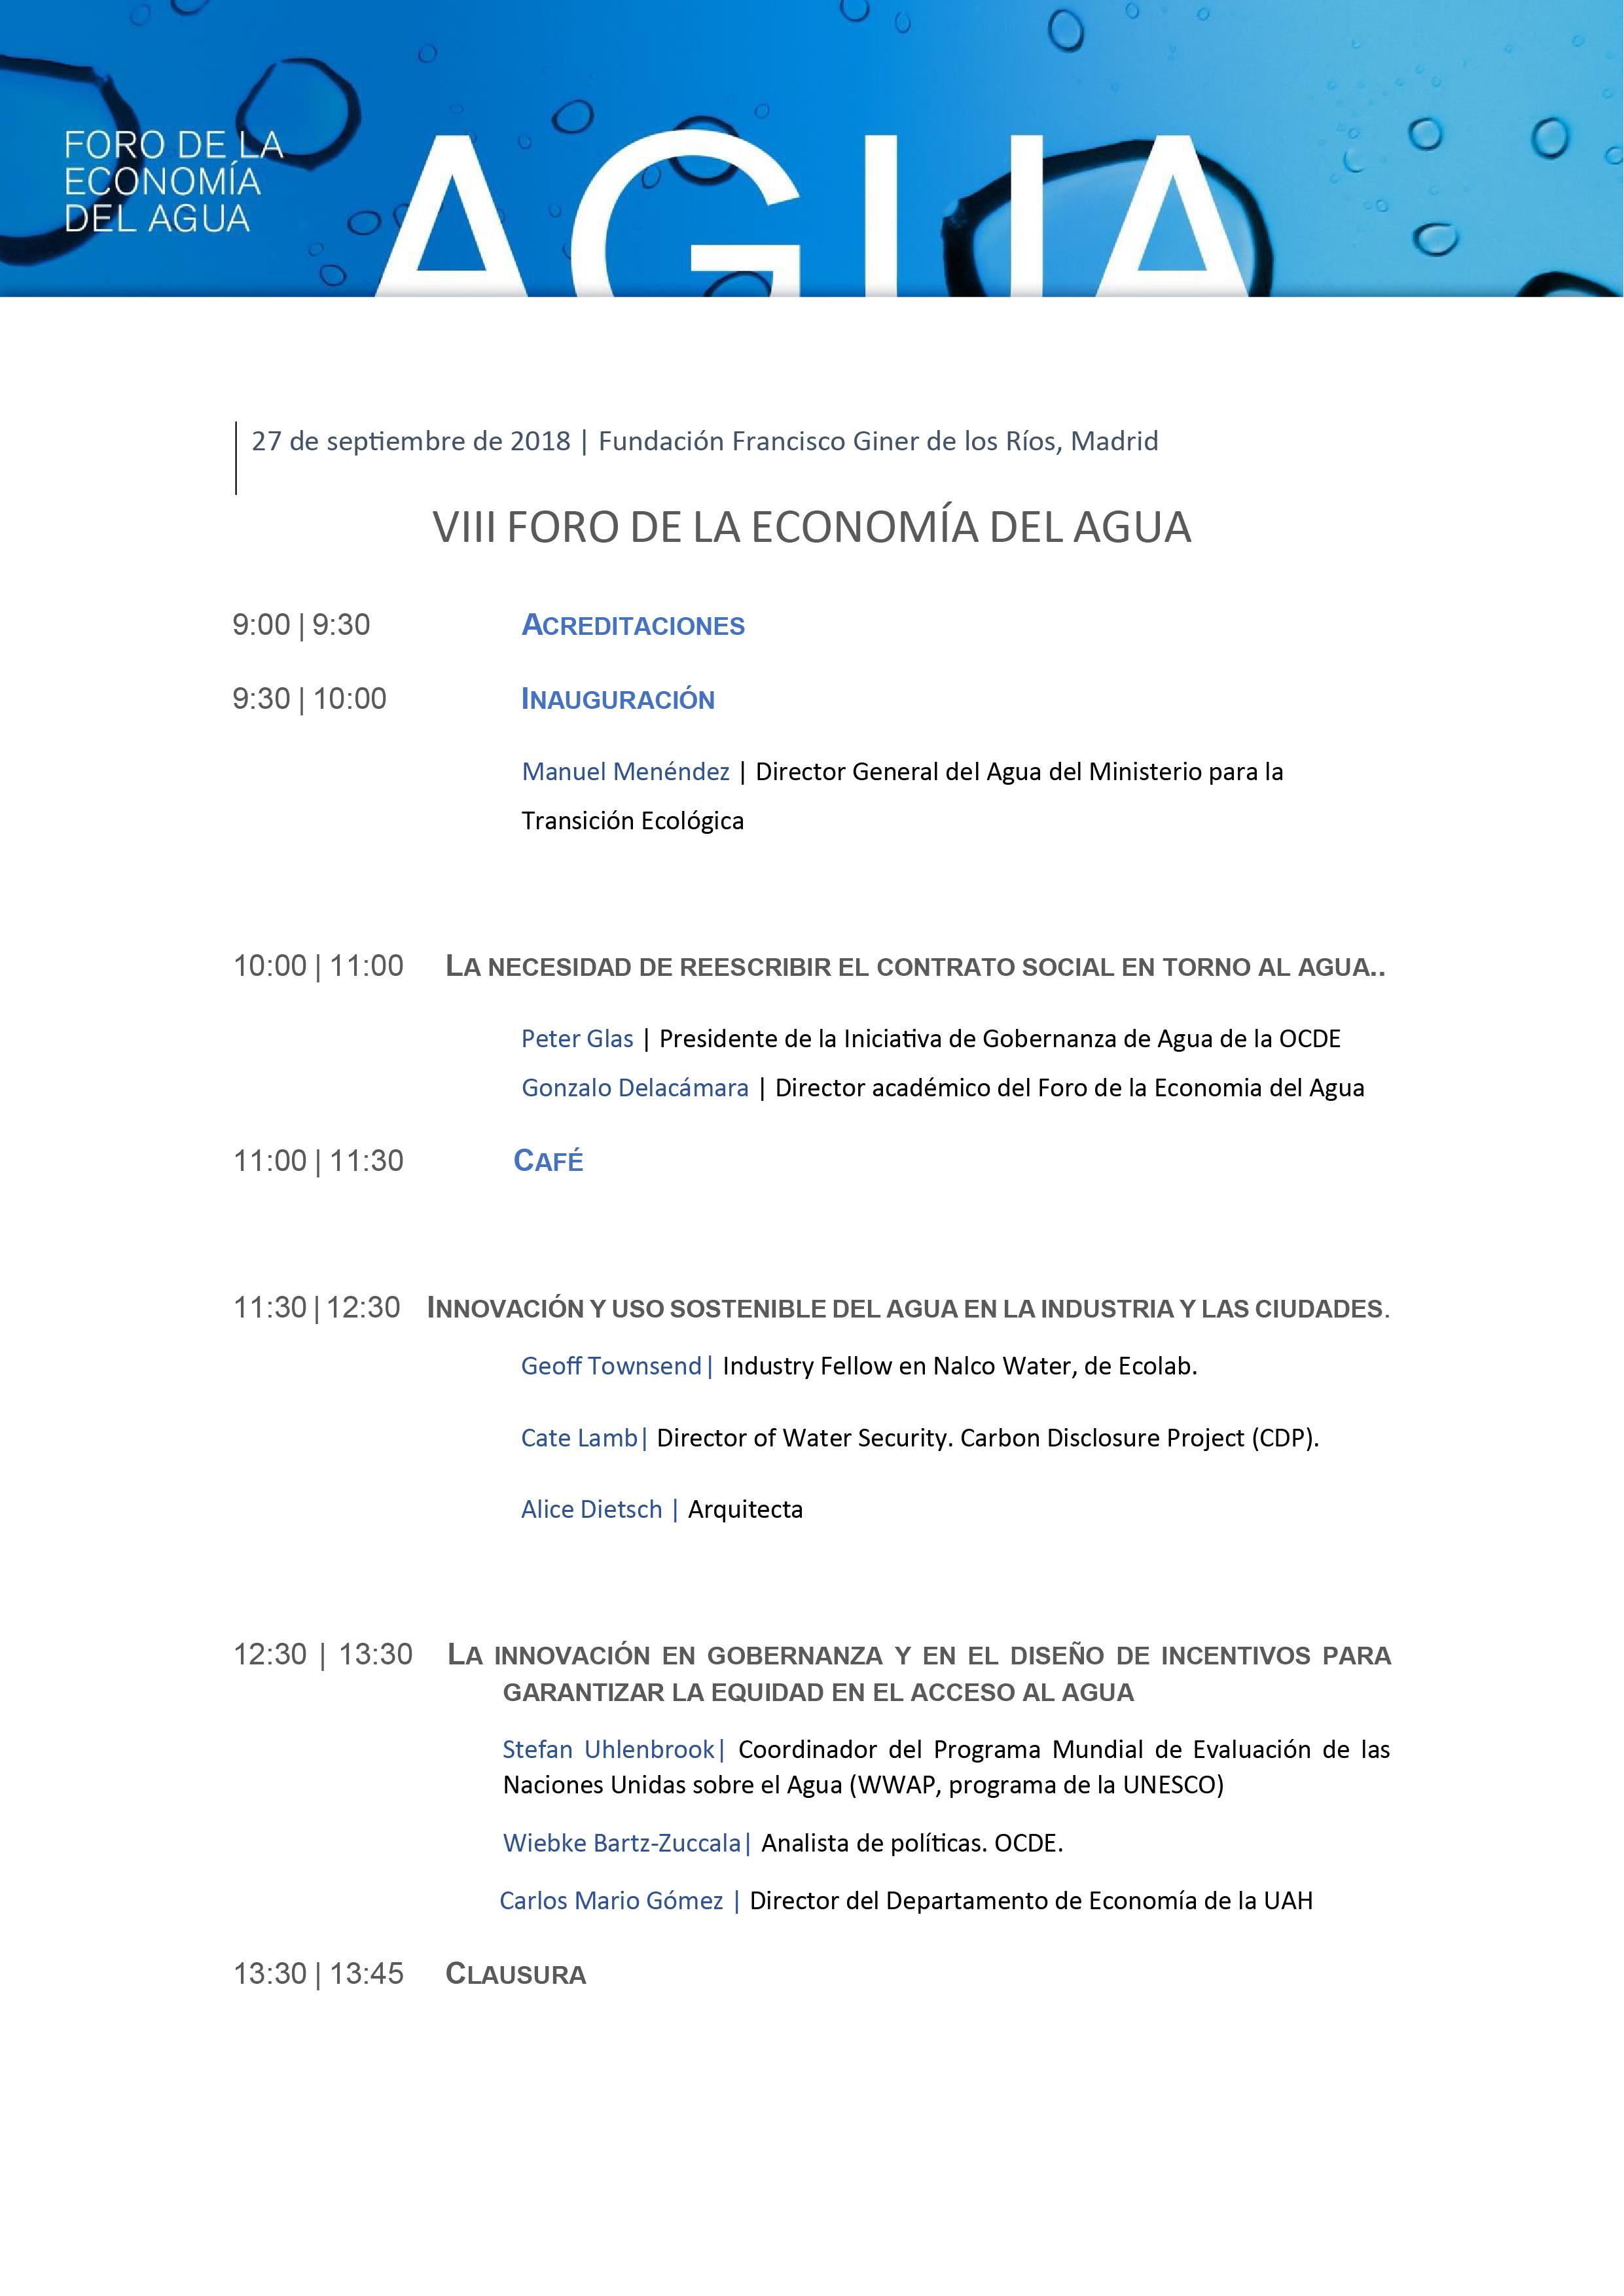 http://forodelaeconomiadelagua.ip-zone.com/mailing-manager/domains/forodelaeconomiadelagua_ip-zone_com/files/img/180913-programa-viii-foro-de-la-economia-del-agua-.jpg